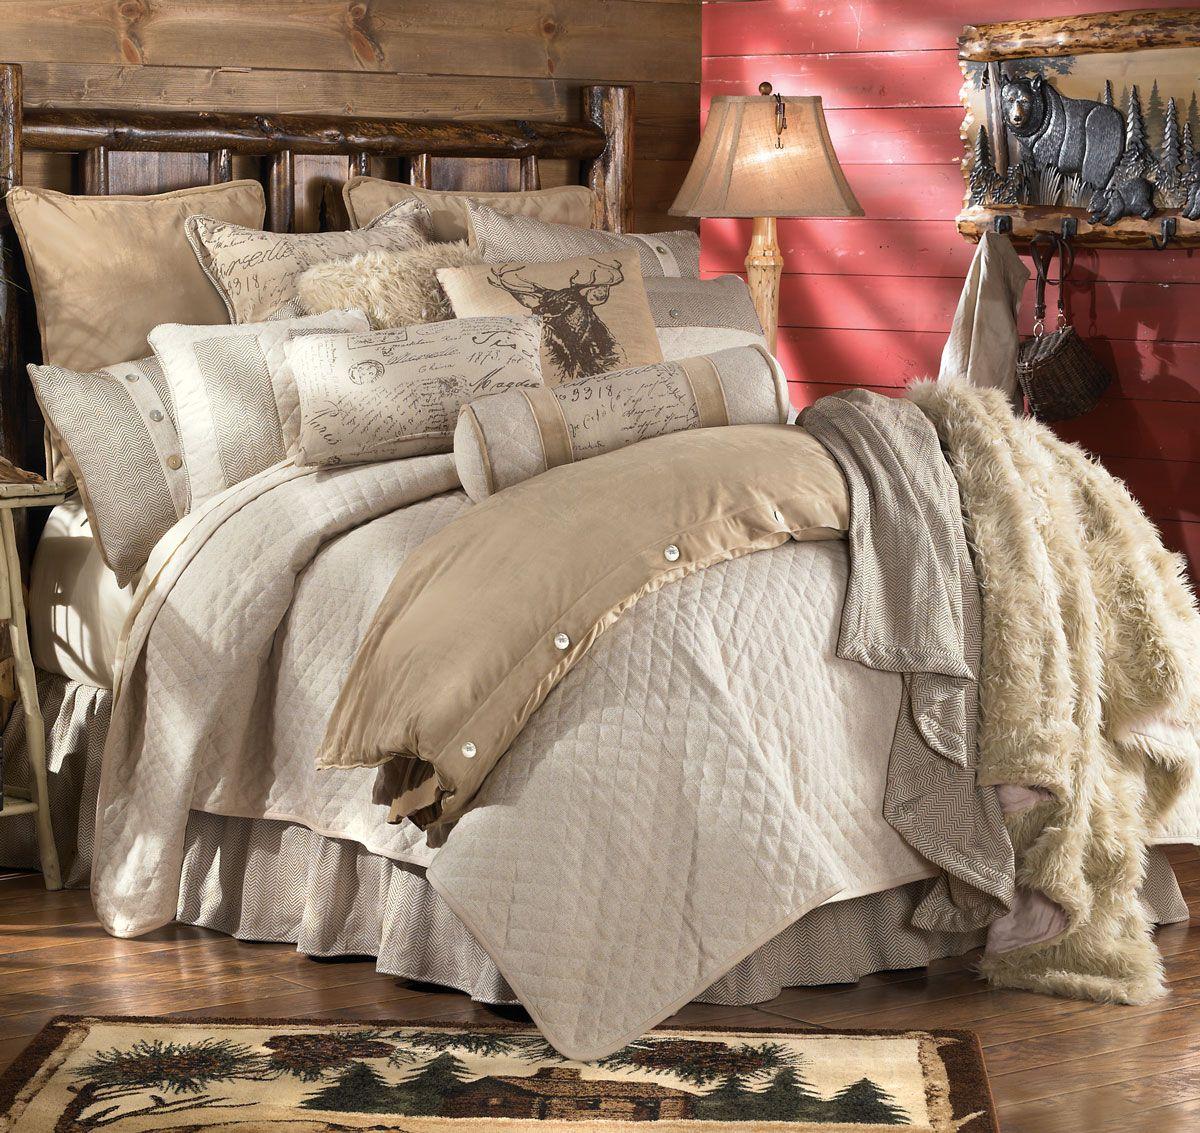 Chestnut Ridge Plaid Bed Set Queen Clearance Luxury Bedding